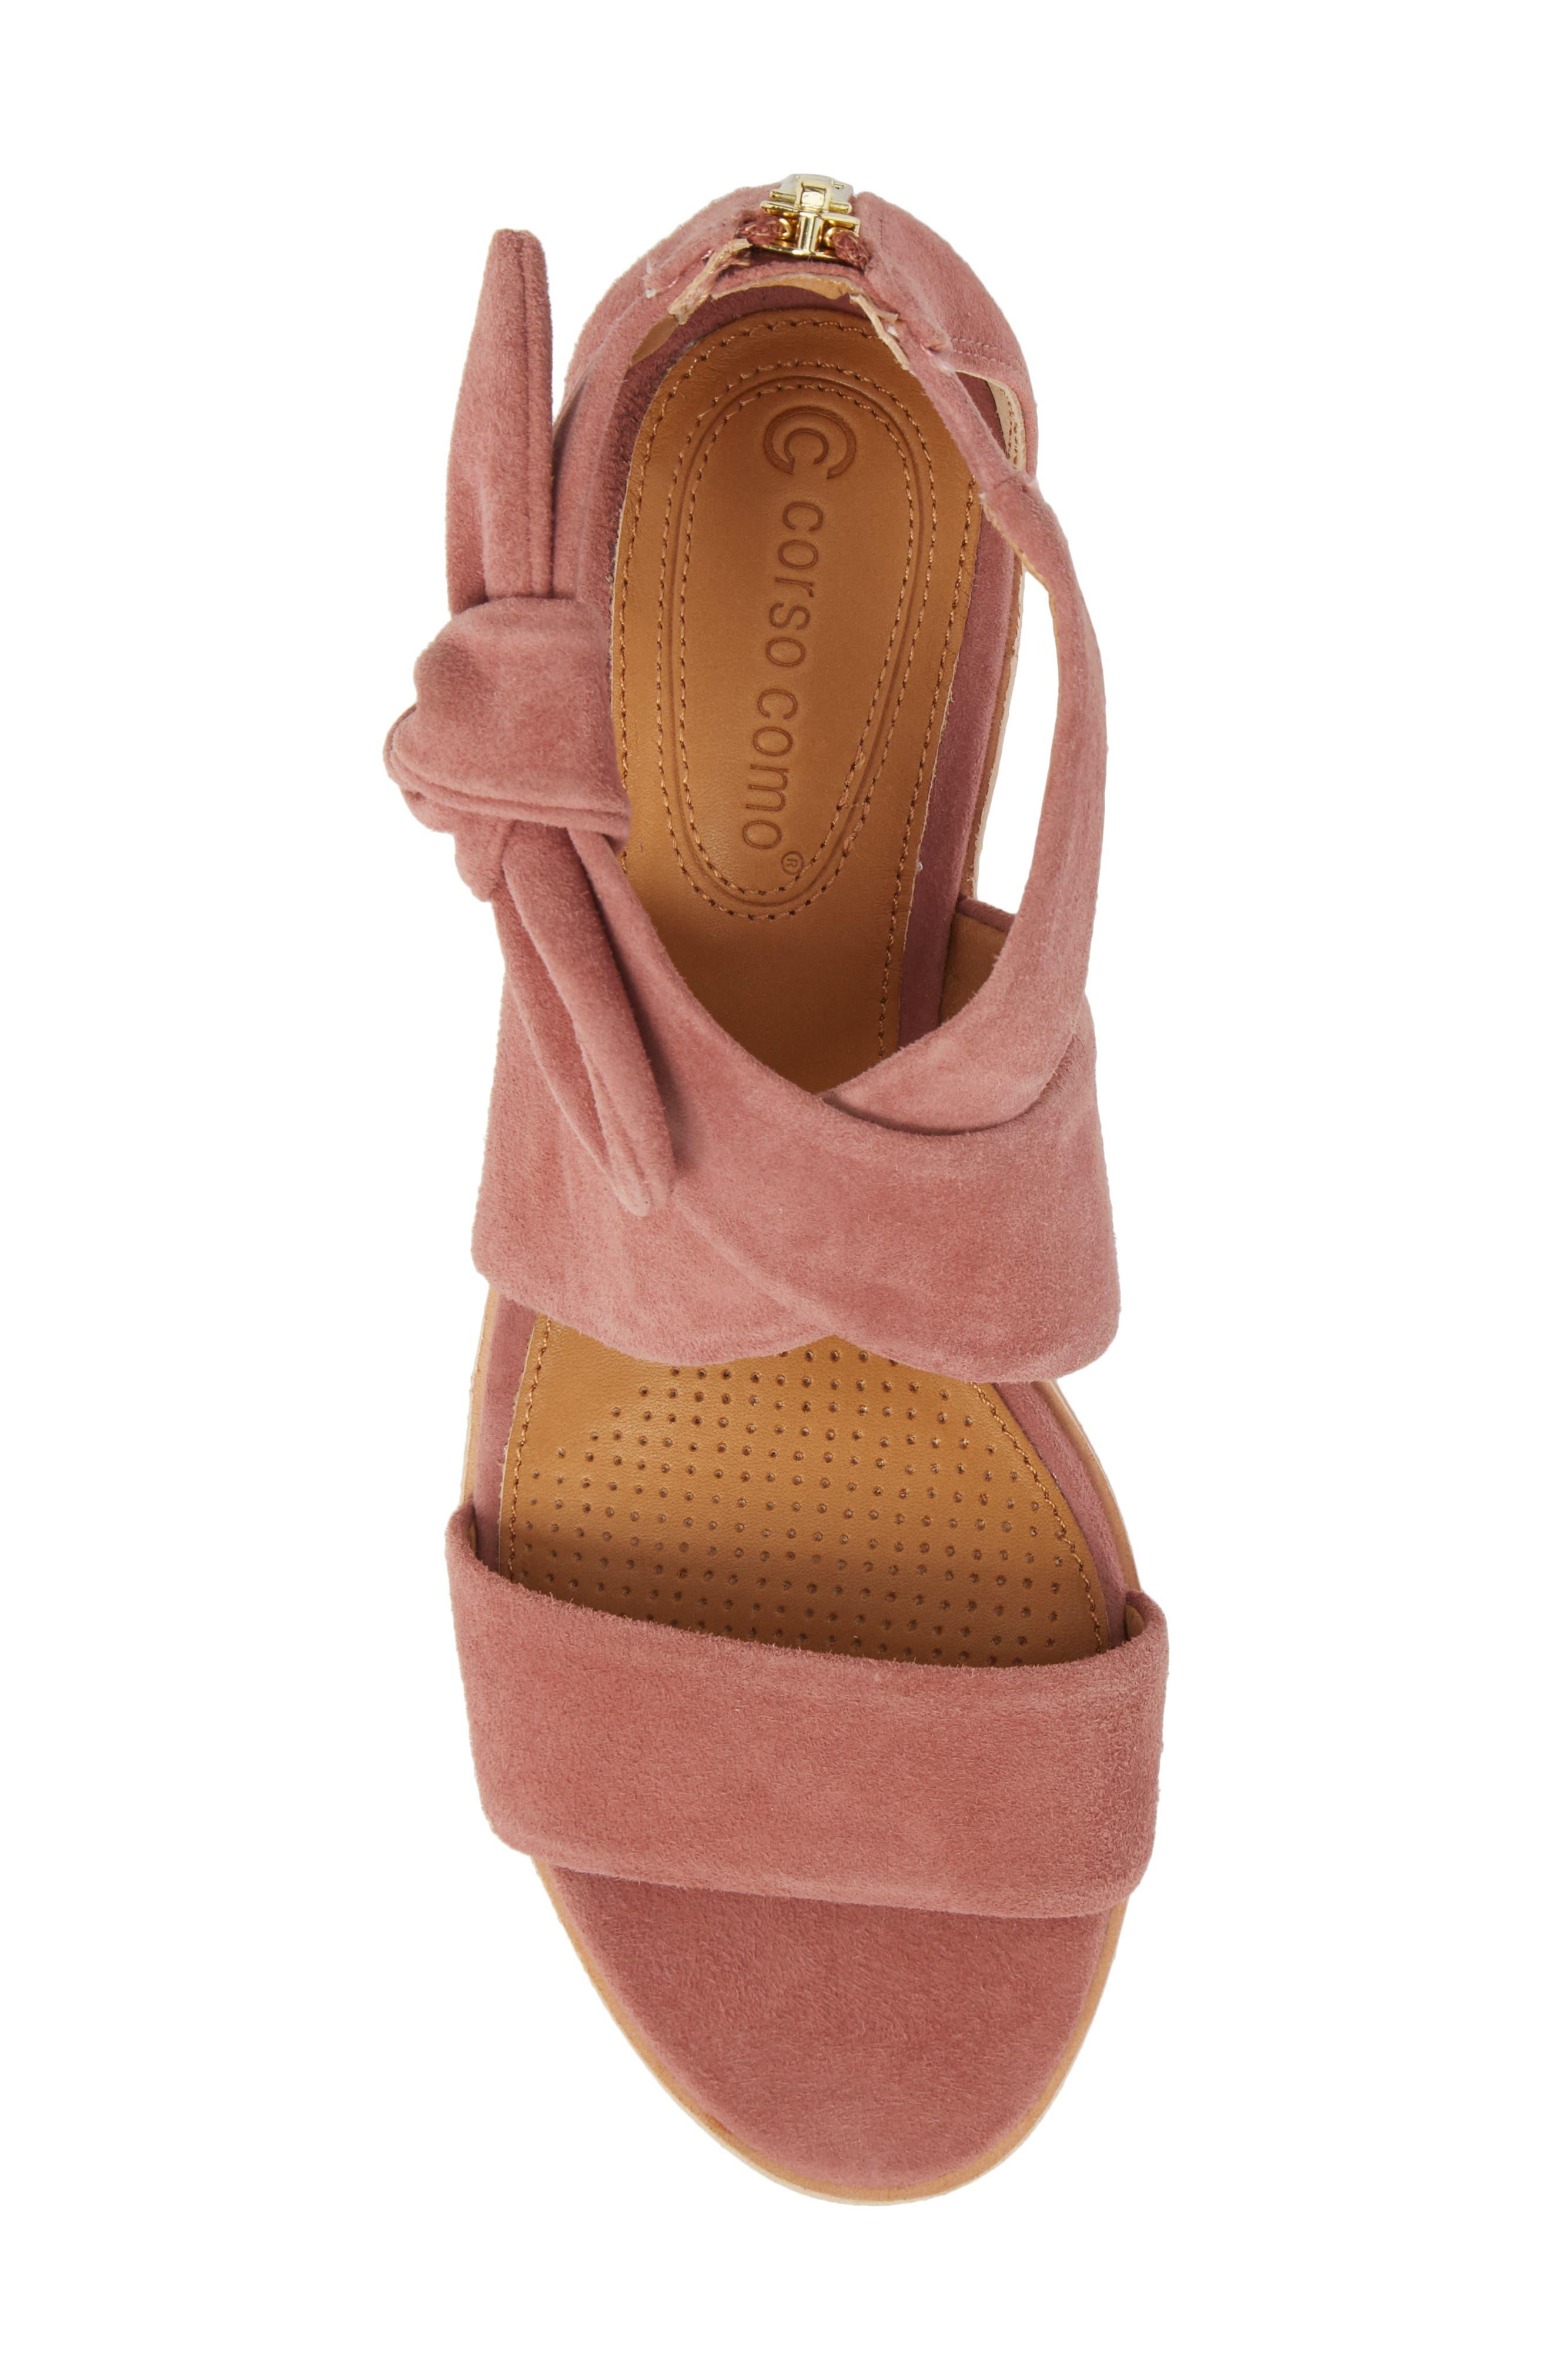 Rasque Sandal,                             Alternate thumbnail 5, color,                             Old Rose Leather